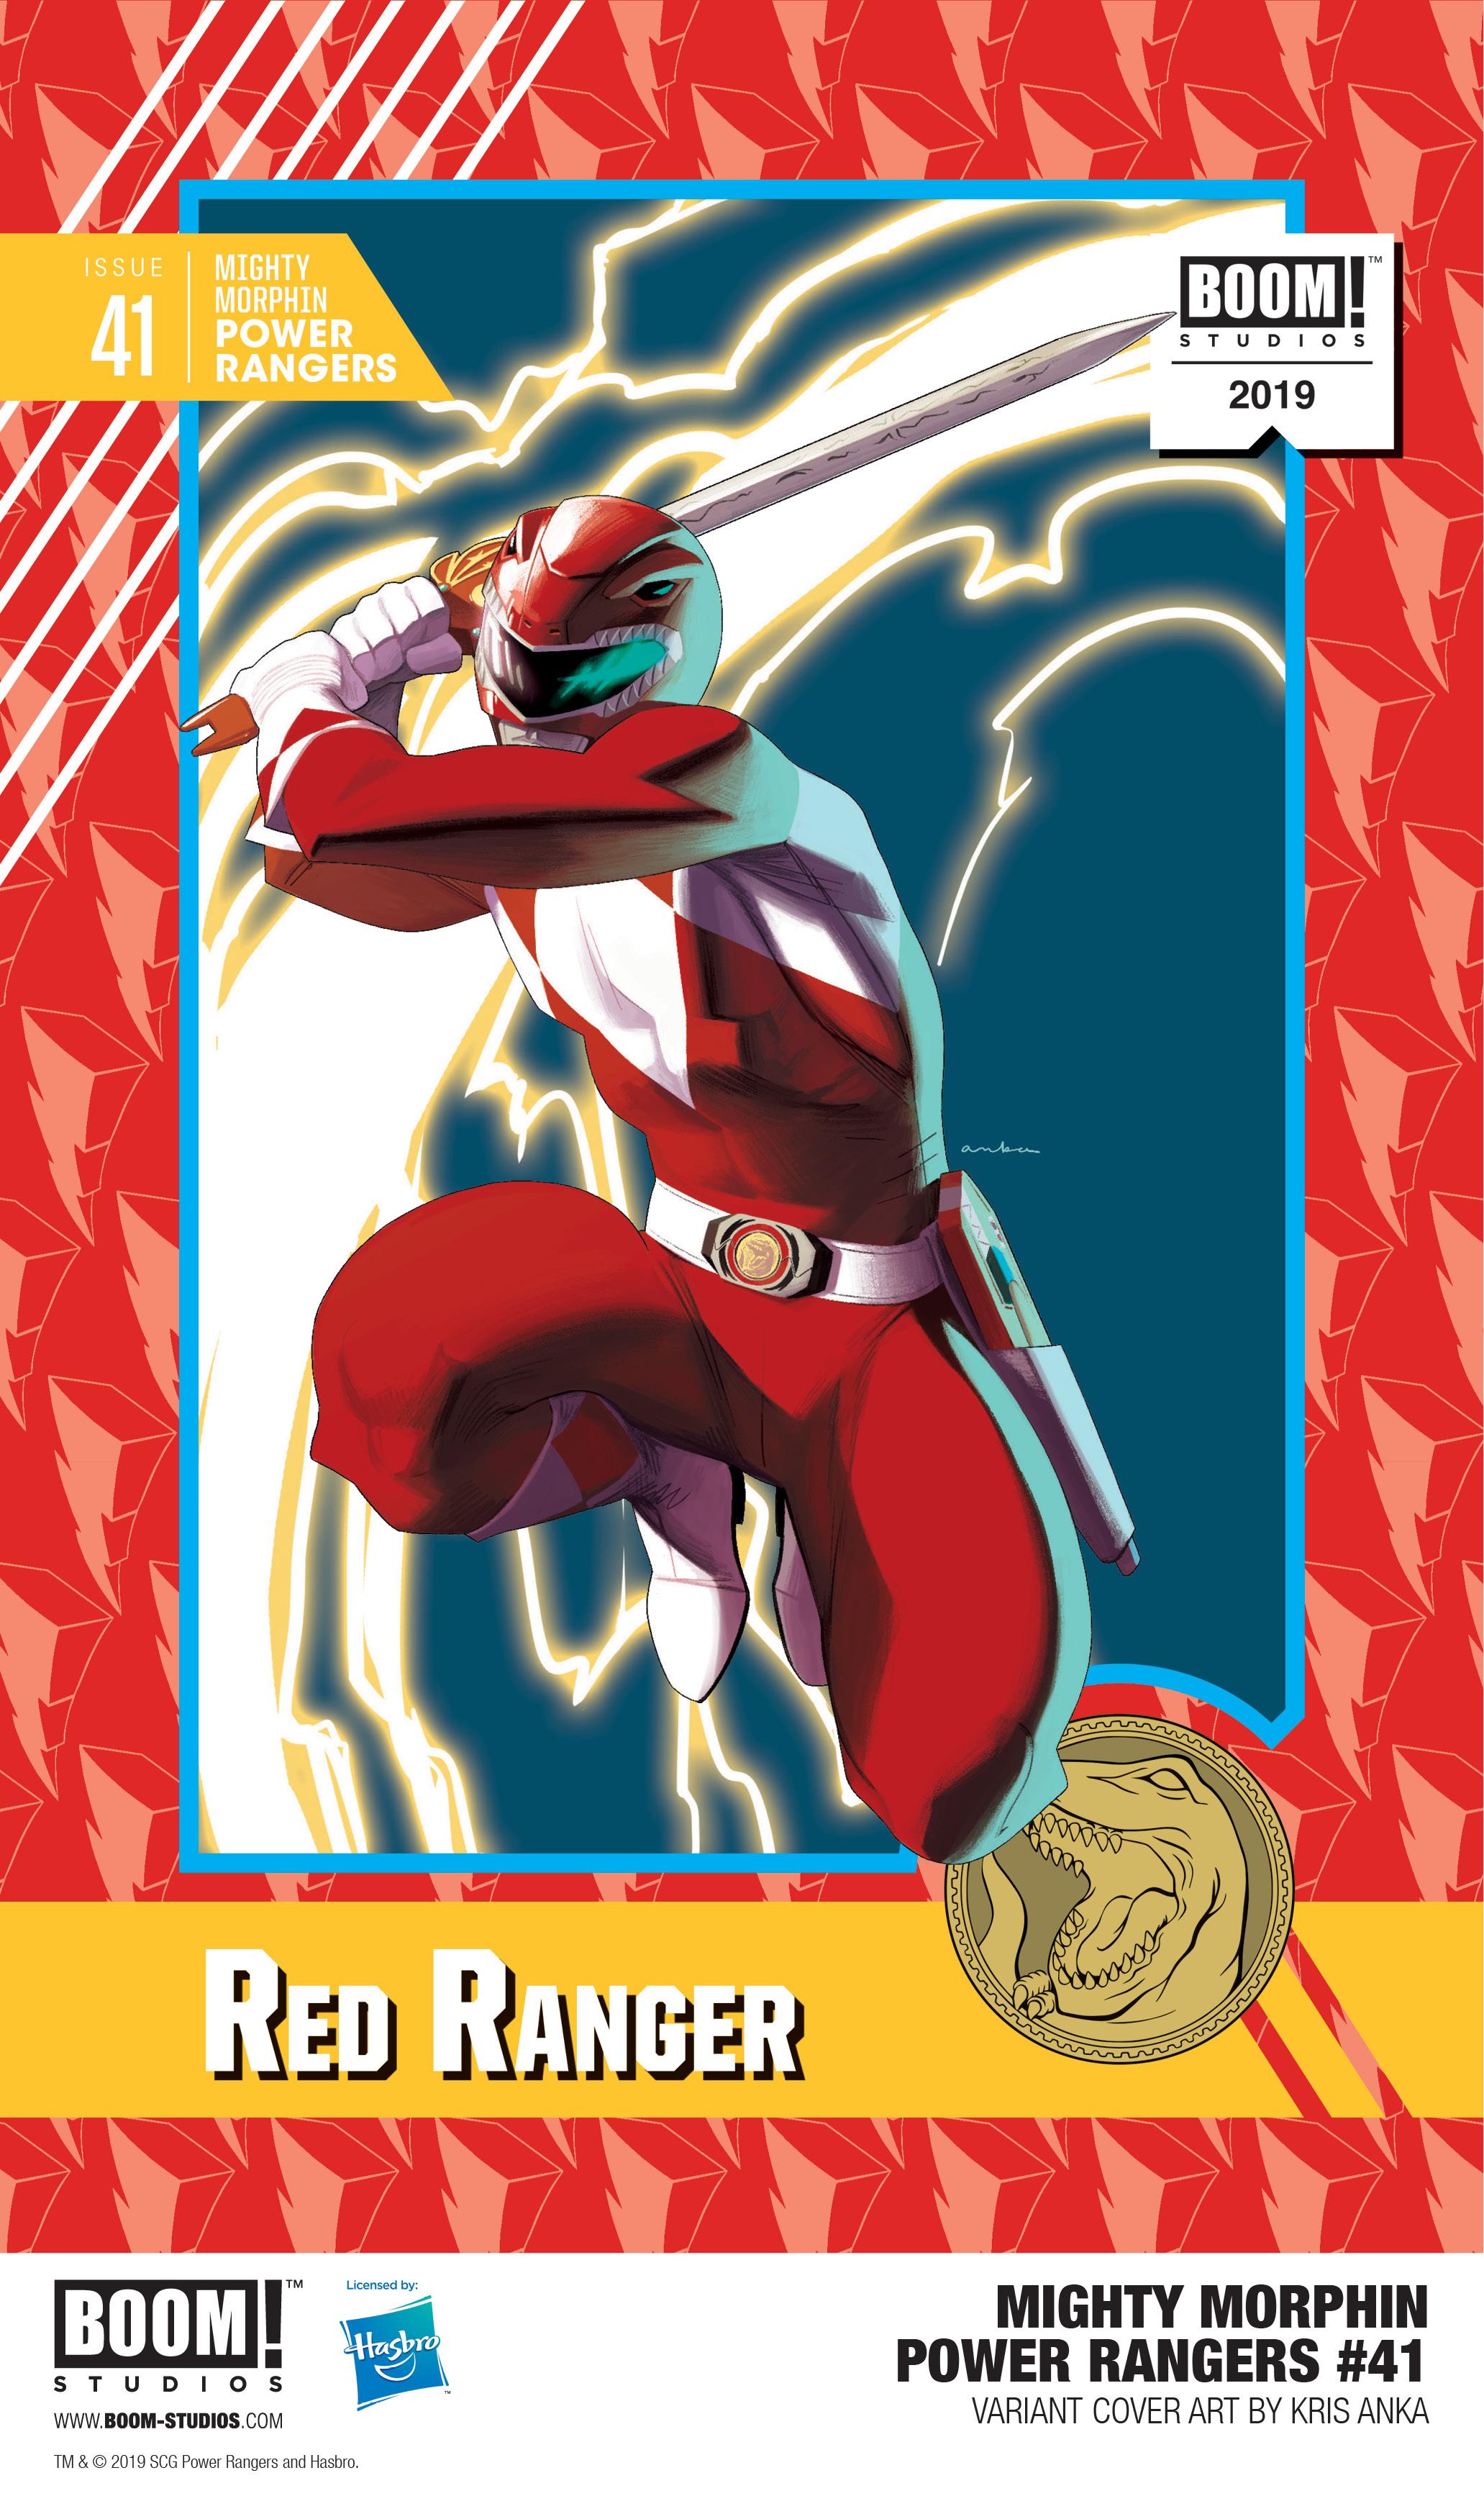 Power Rangers #41